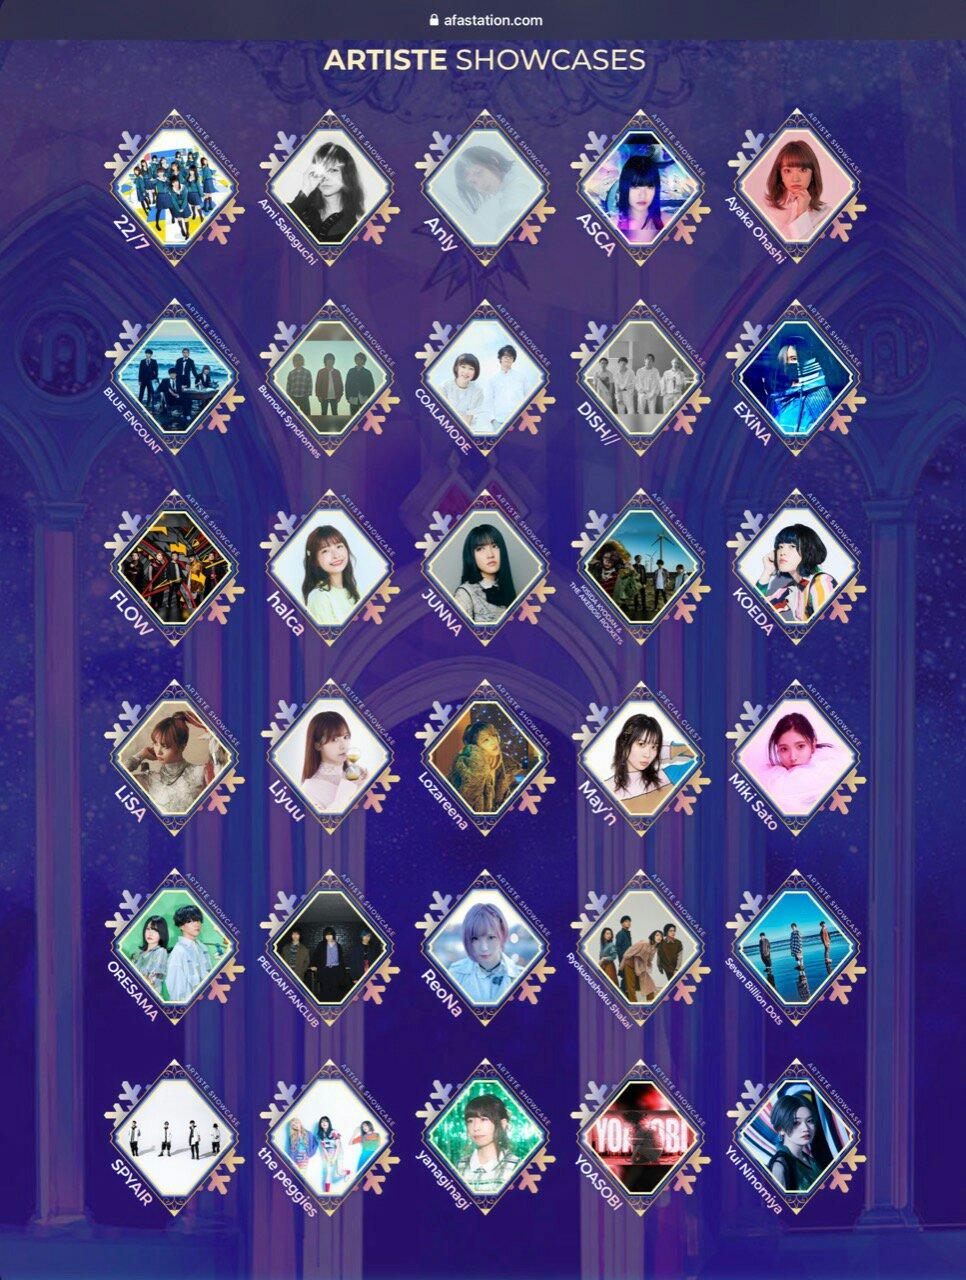 Japan Idol Group 22/7, Moona Hoshinova, Ayaka Ohashi, dan Lebih Banyak Lagi Musisi & Idol Favorit Tampil di Stage Virtual AFA! 2